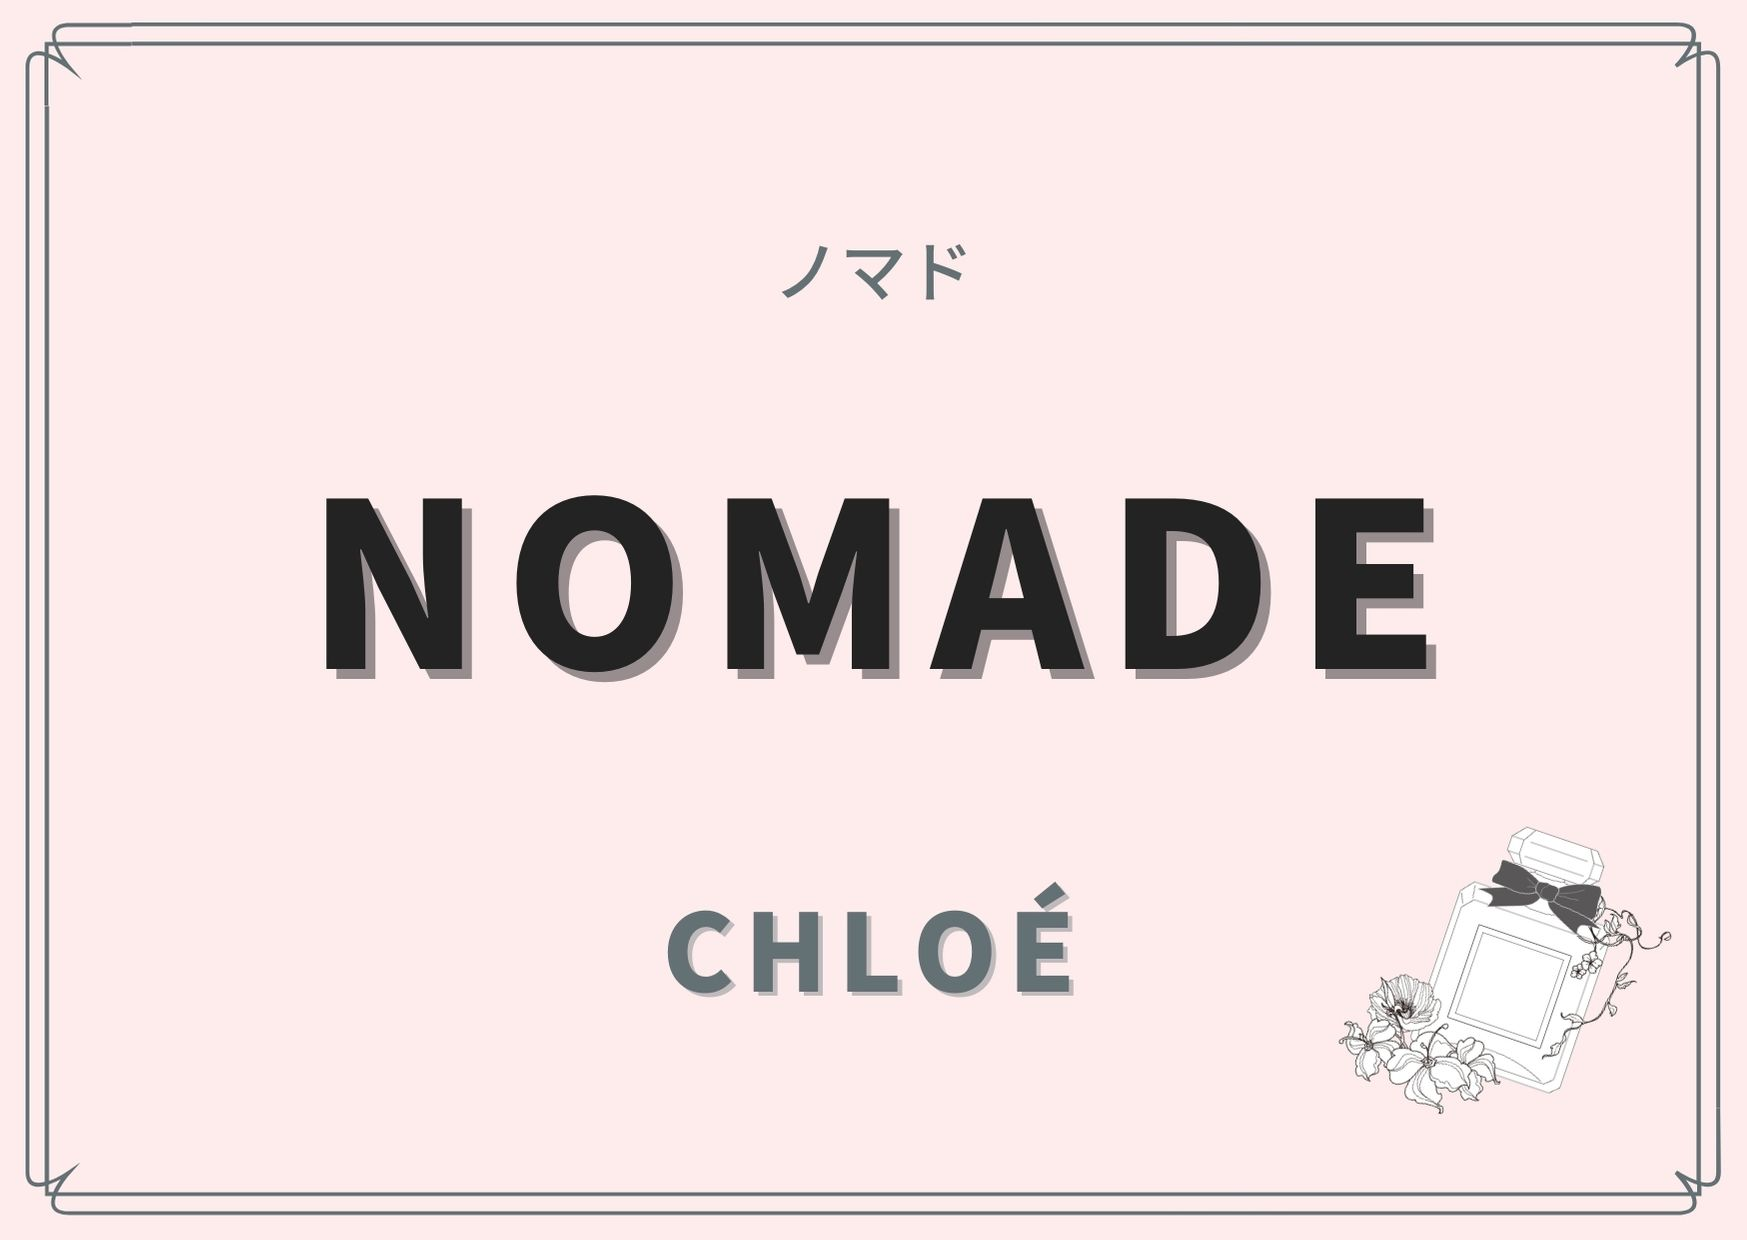 nomade(ノマド)/Chloé(クロエ)